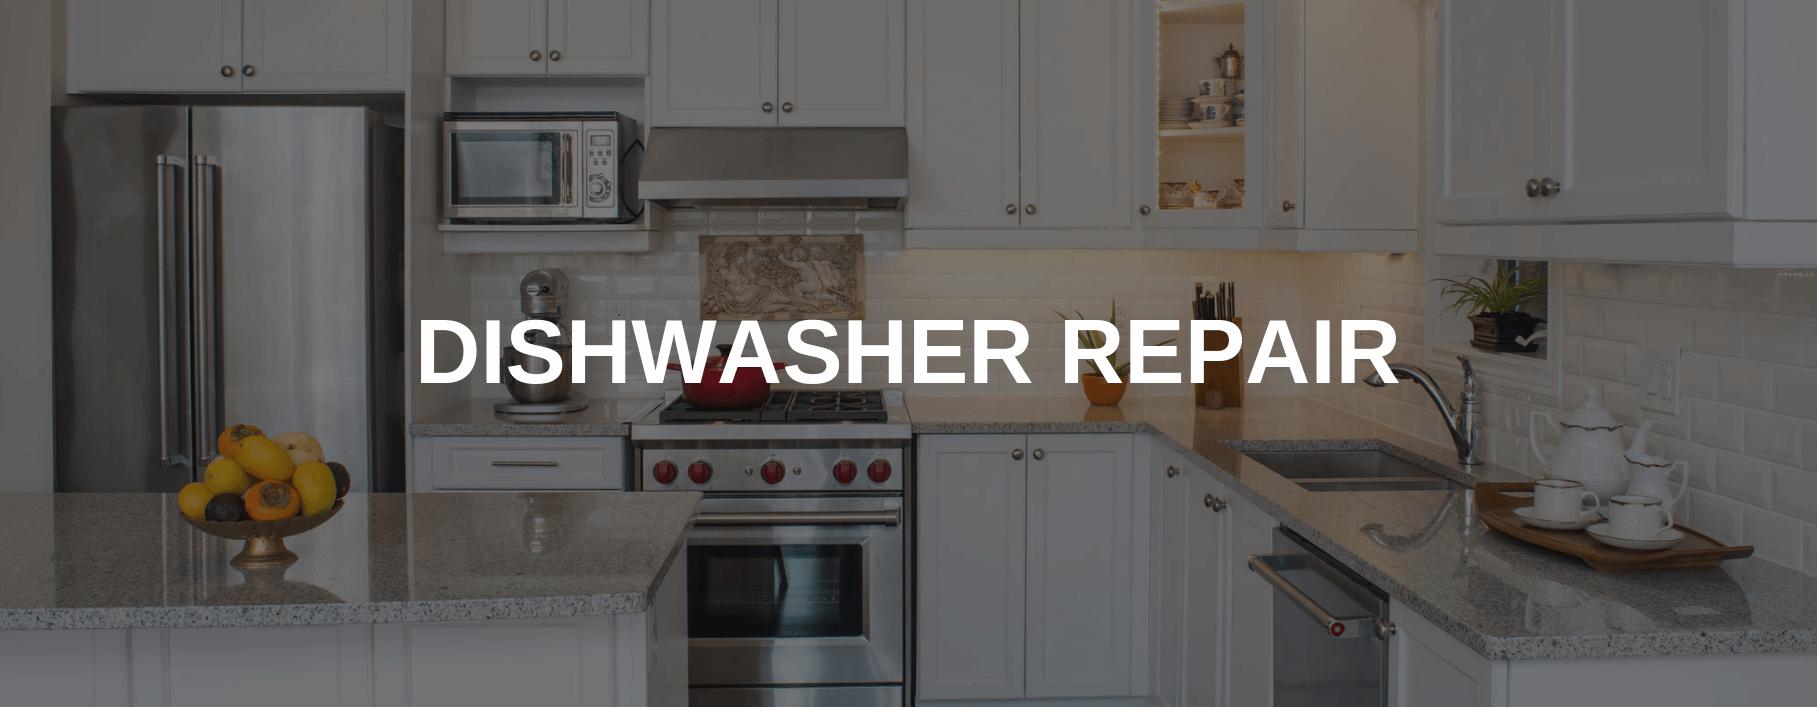 dishwasher repair vernon